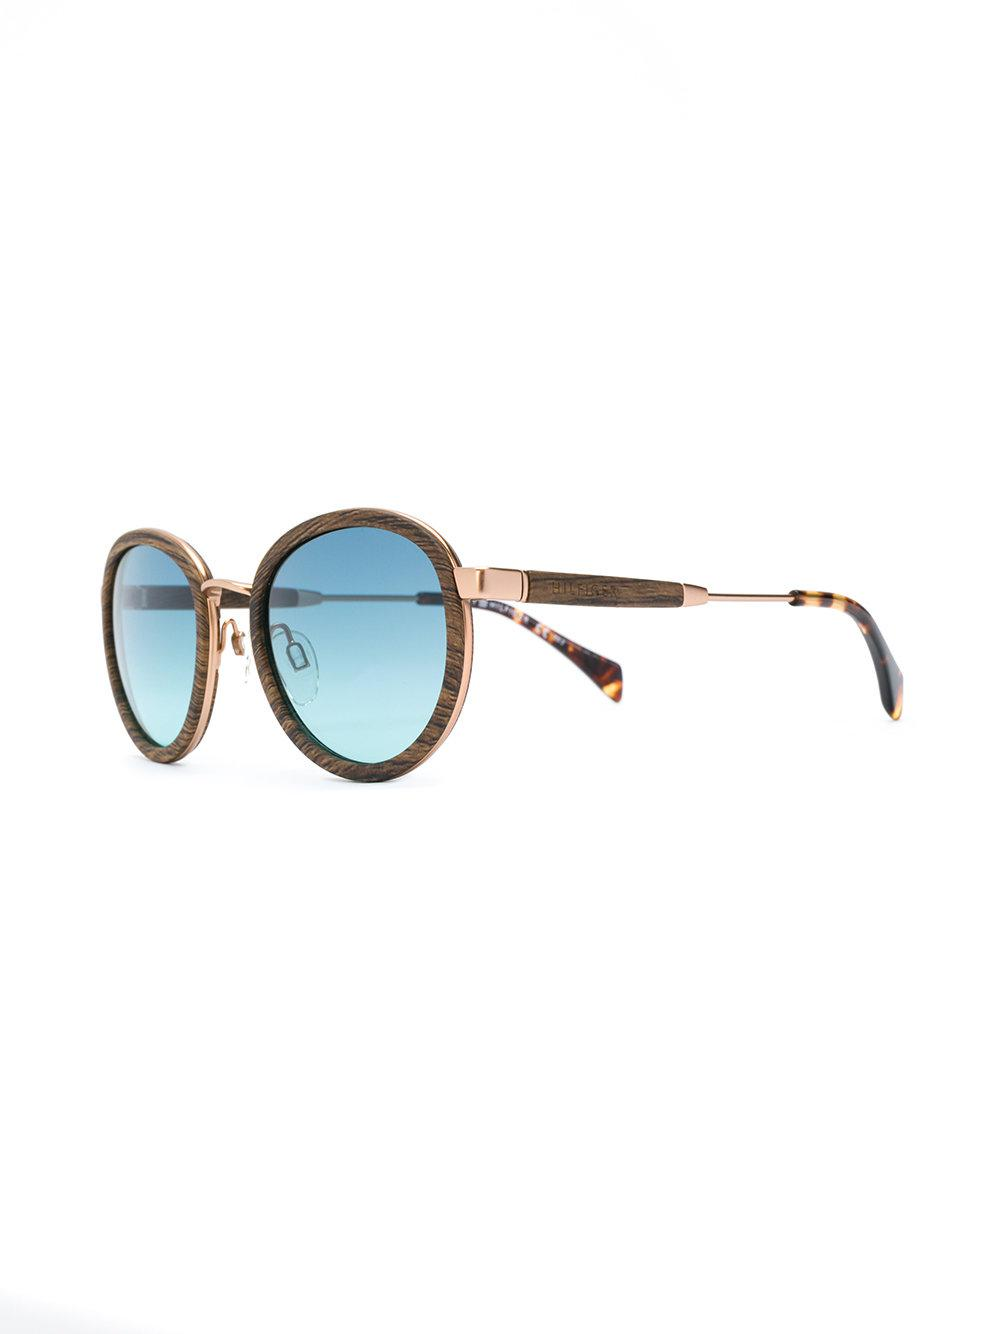 febc5300e4f Tommy Hilfiger Wood Effect Sunglasses in Brown - Lyst